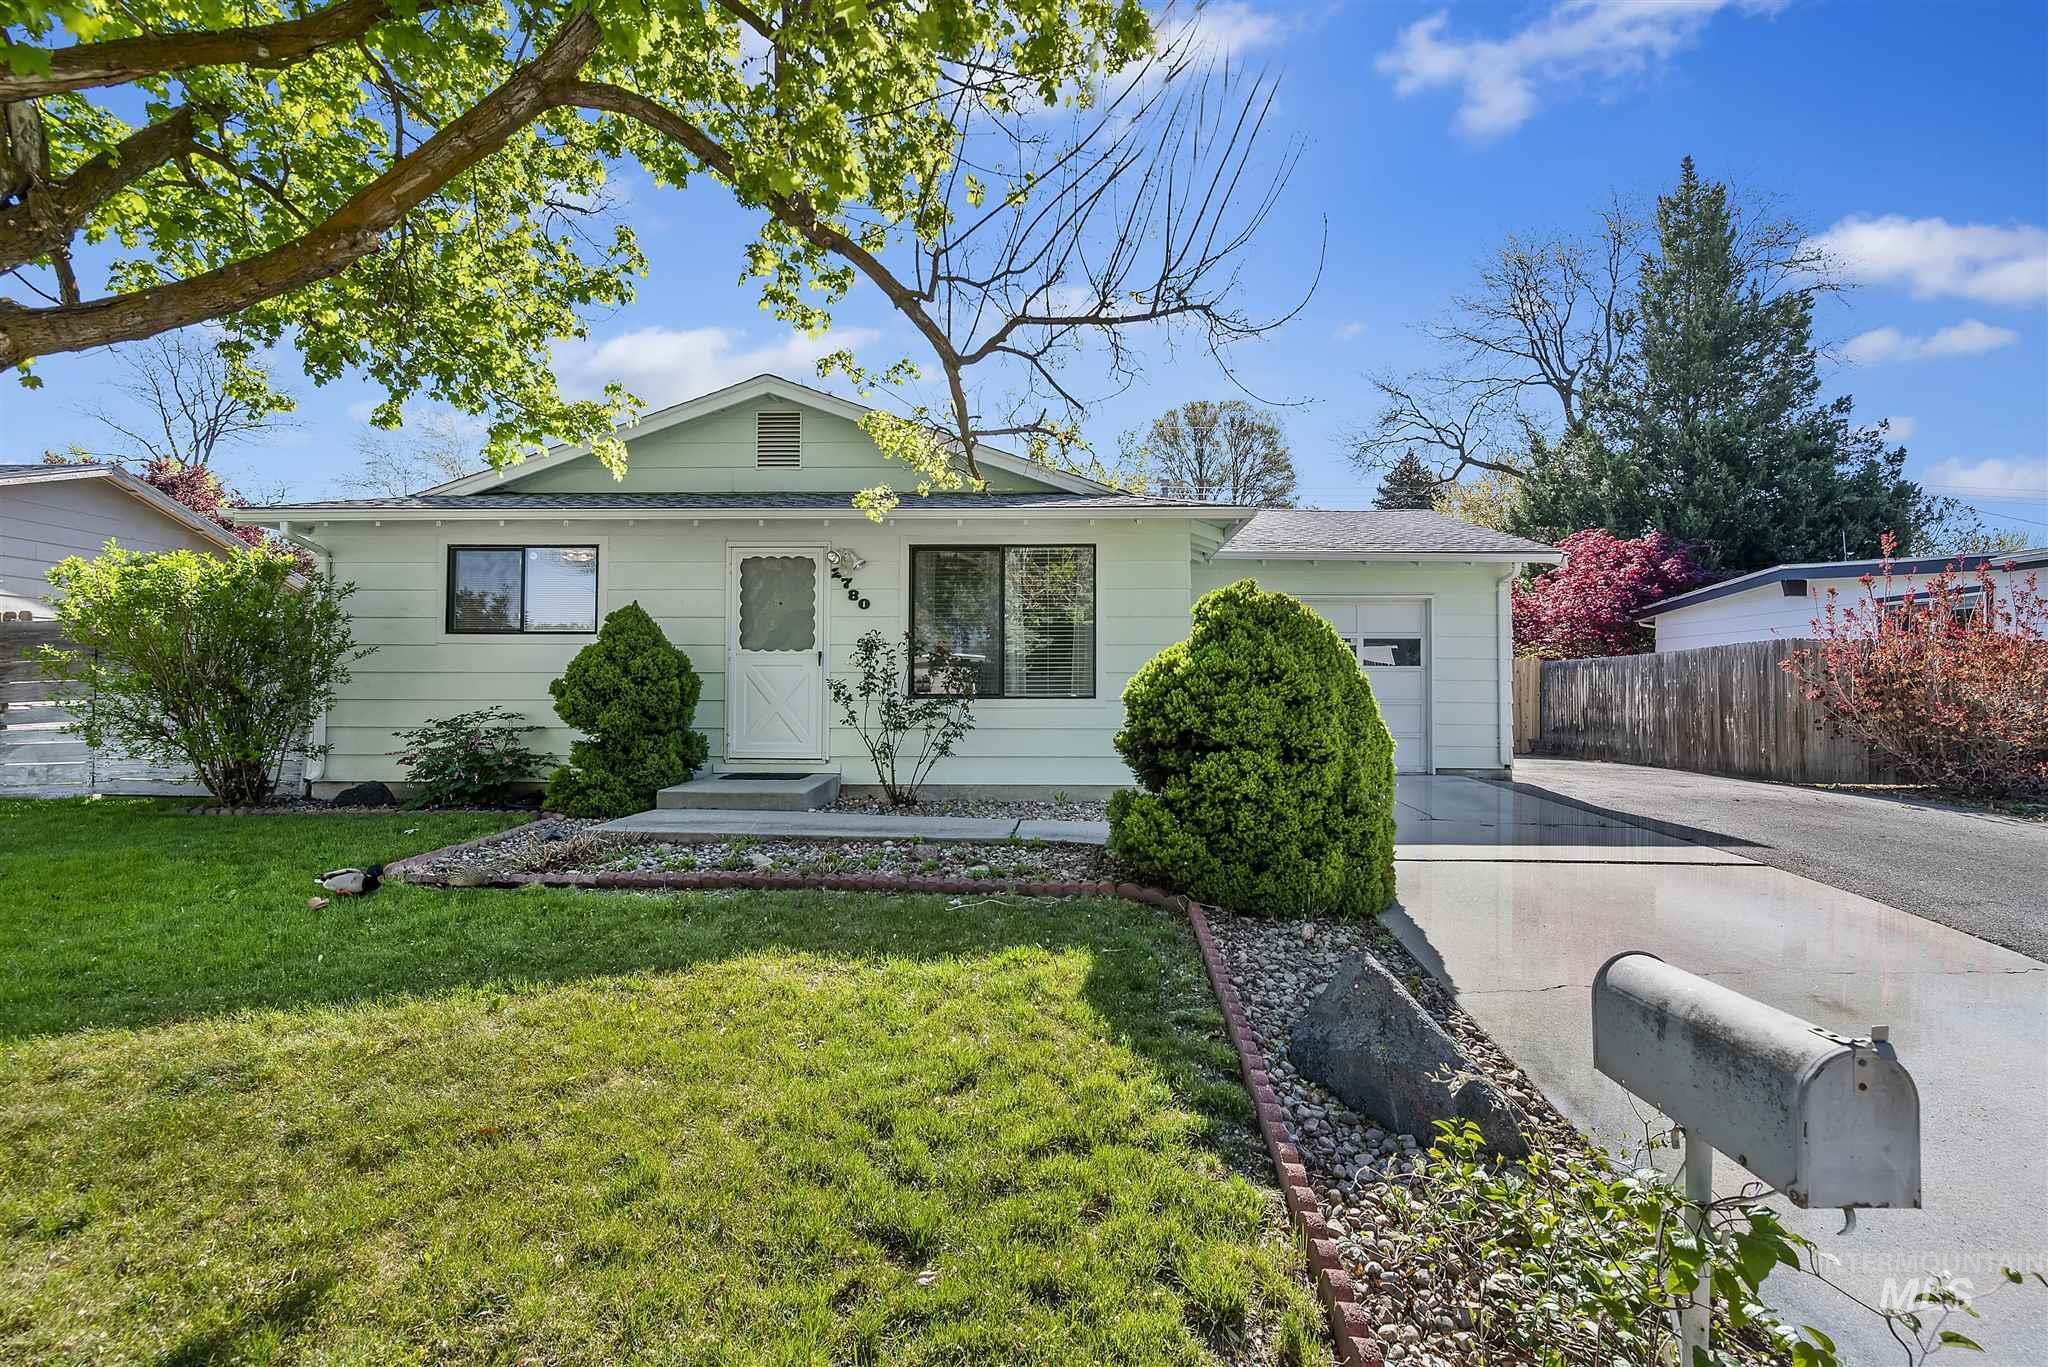 2780 N 38th St Property Photo - Boise, ID real estate listing